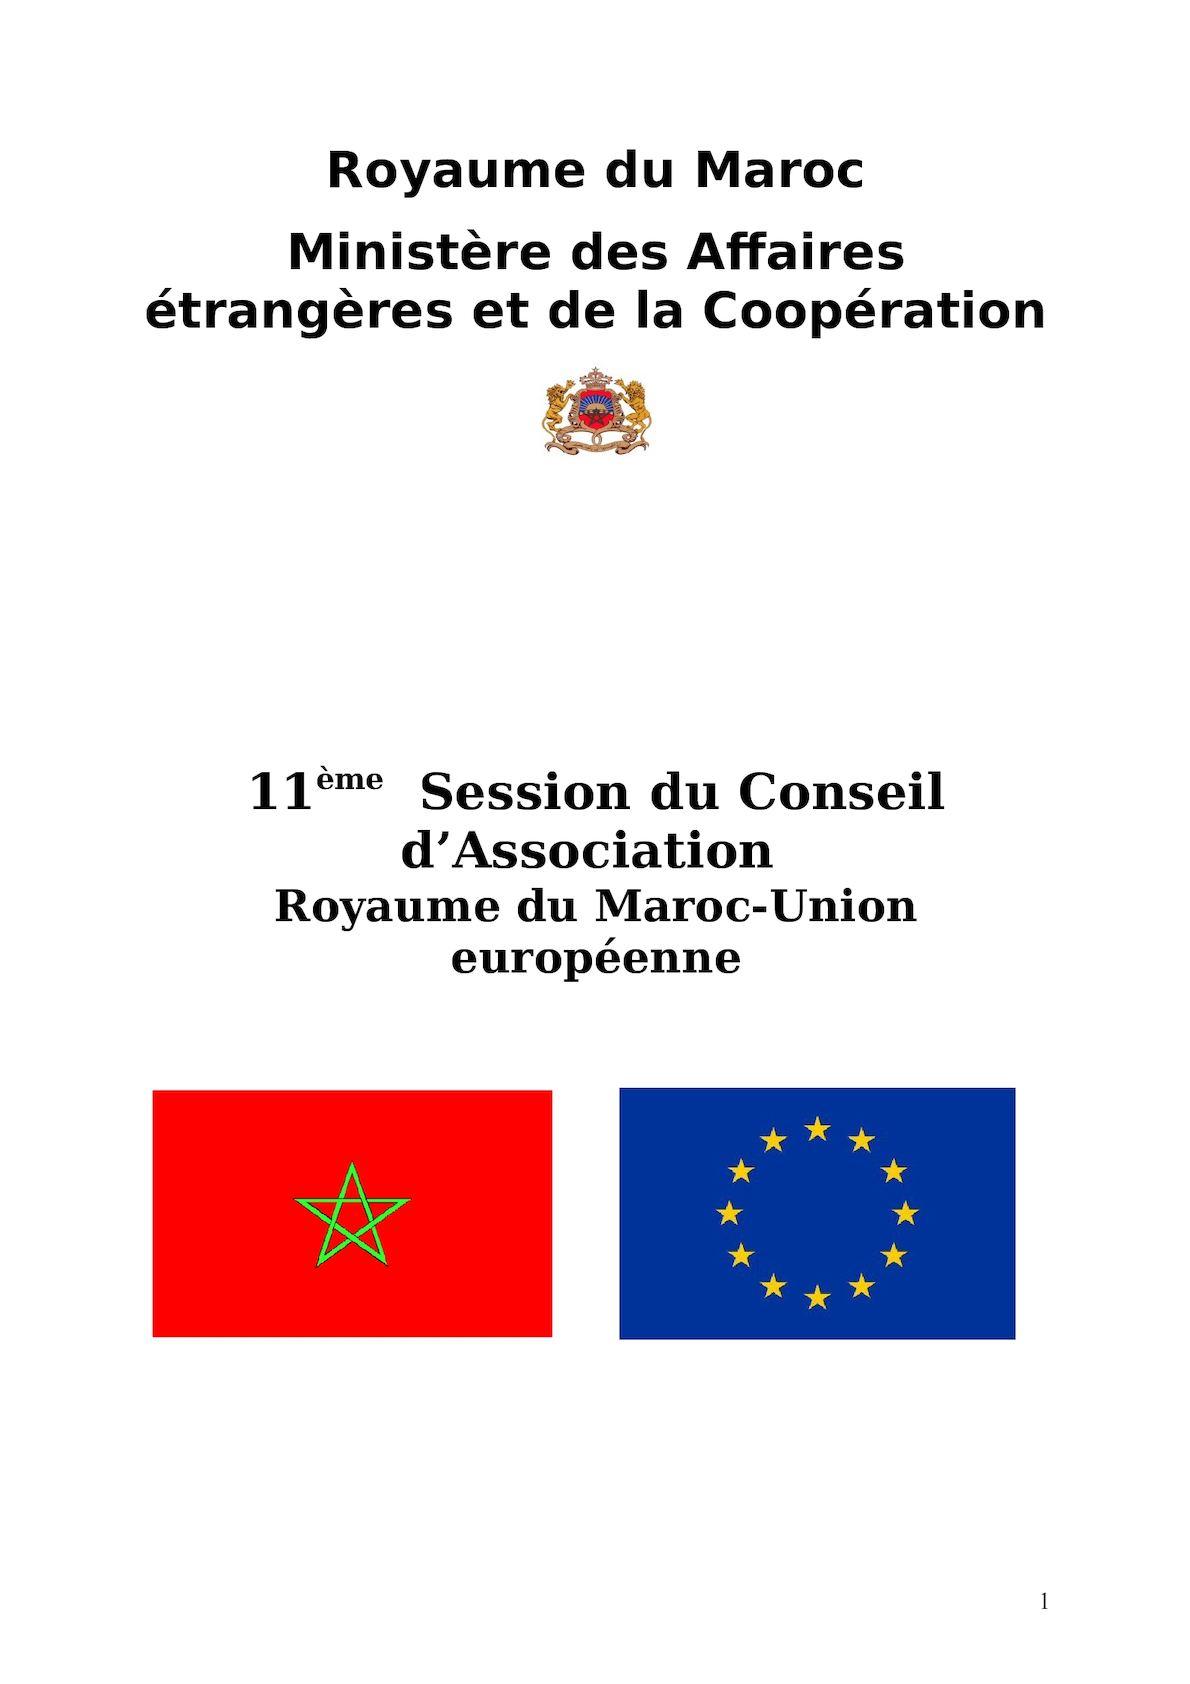 Conseil D'Association 16 Decembre 2013 V Final 1